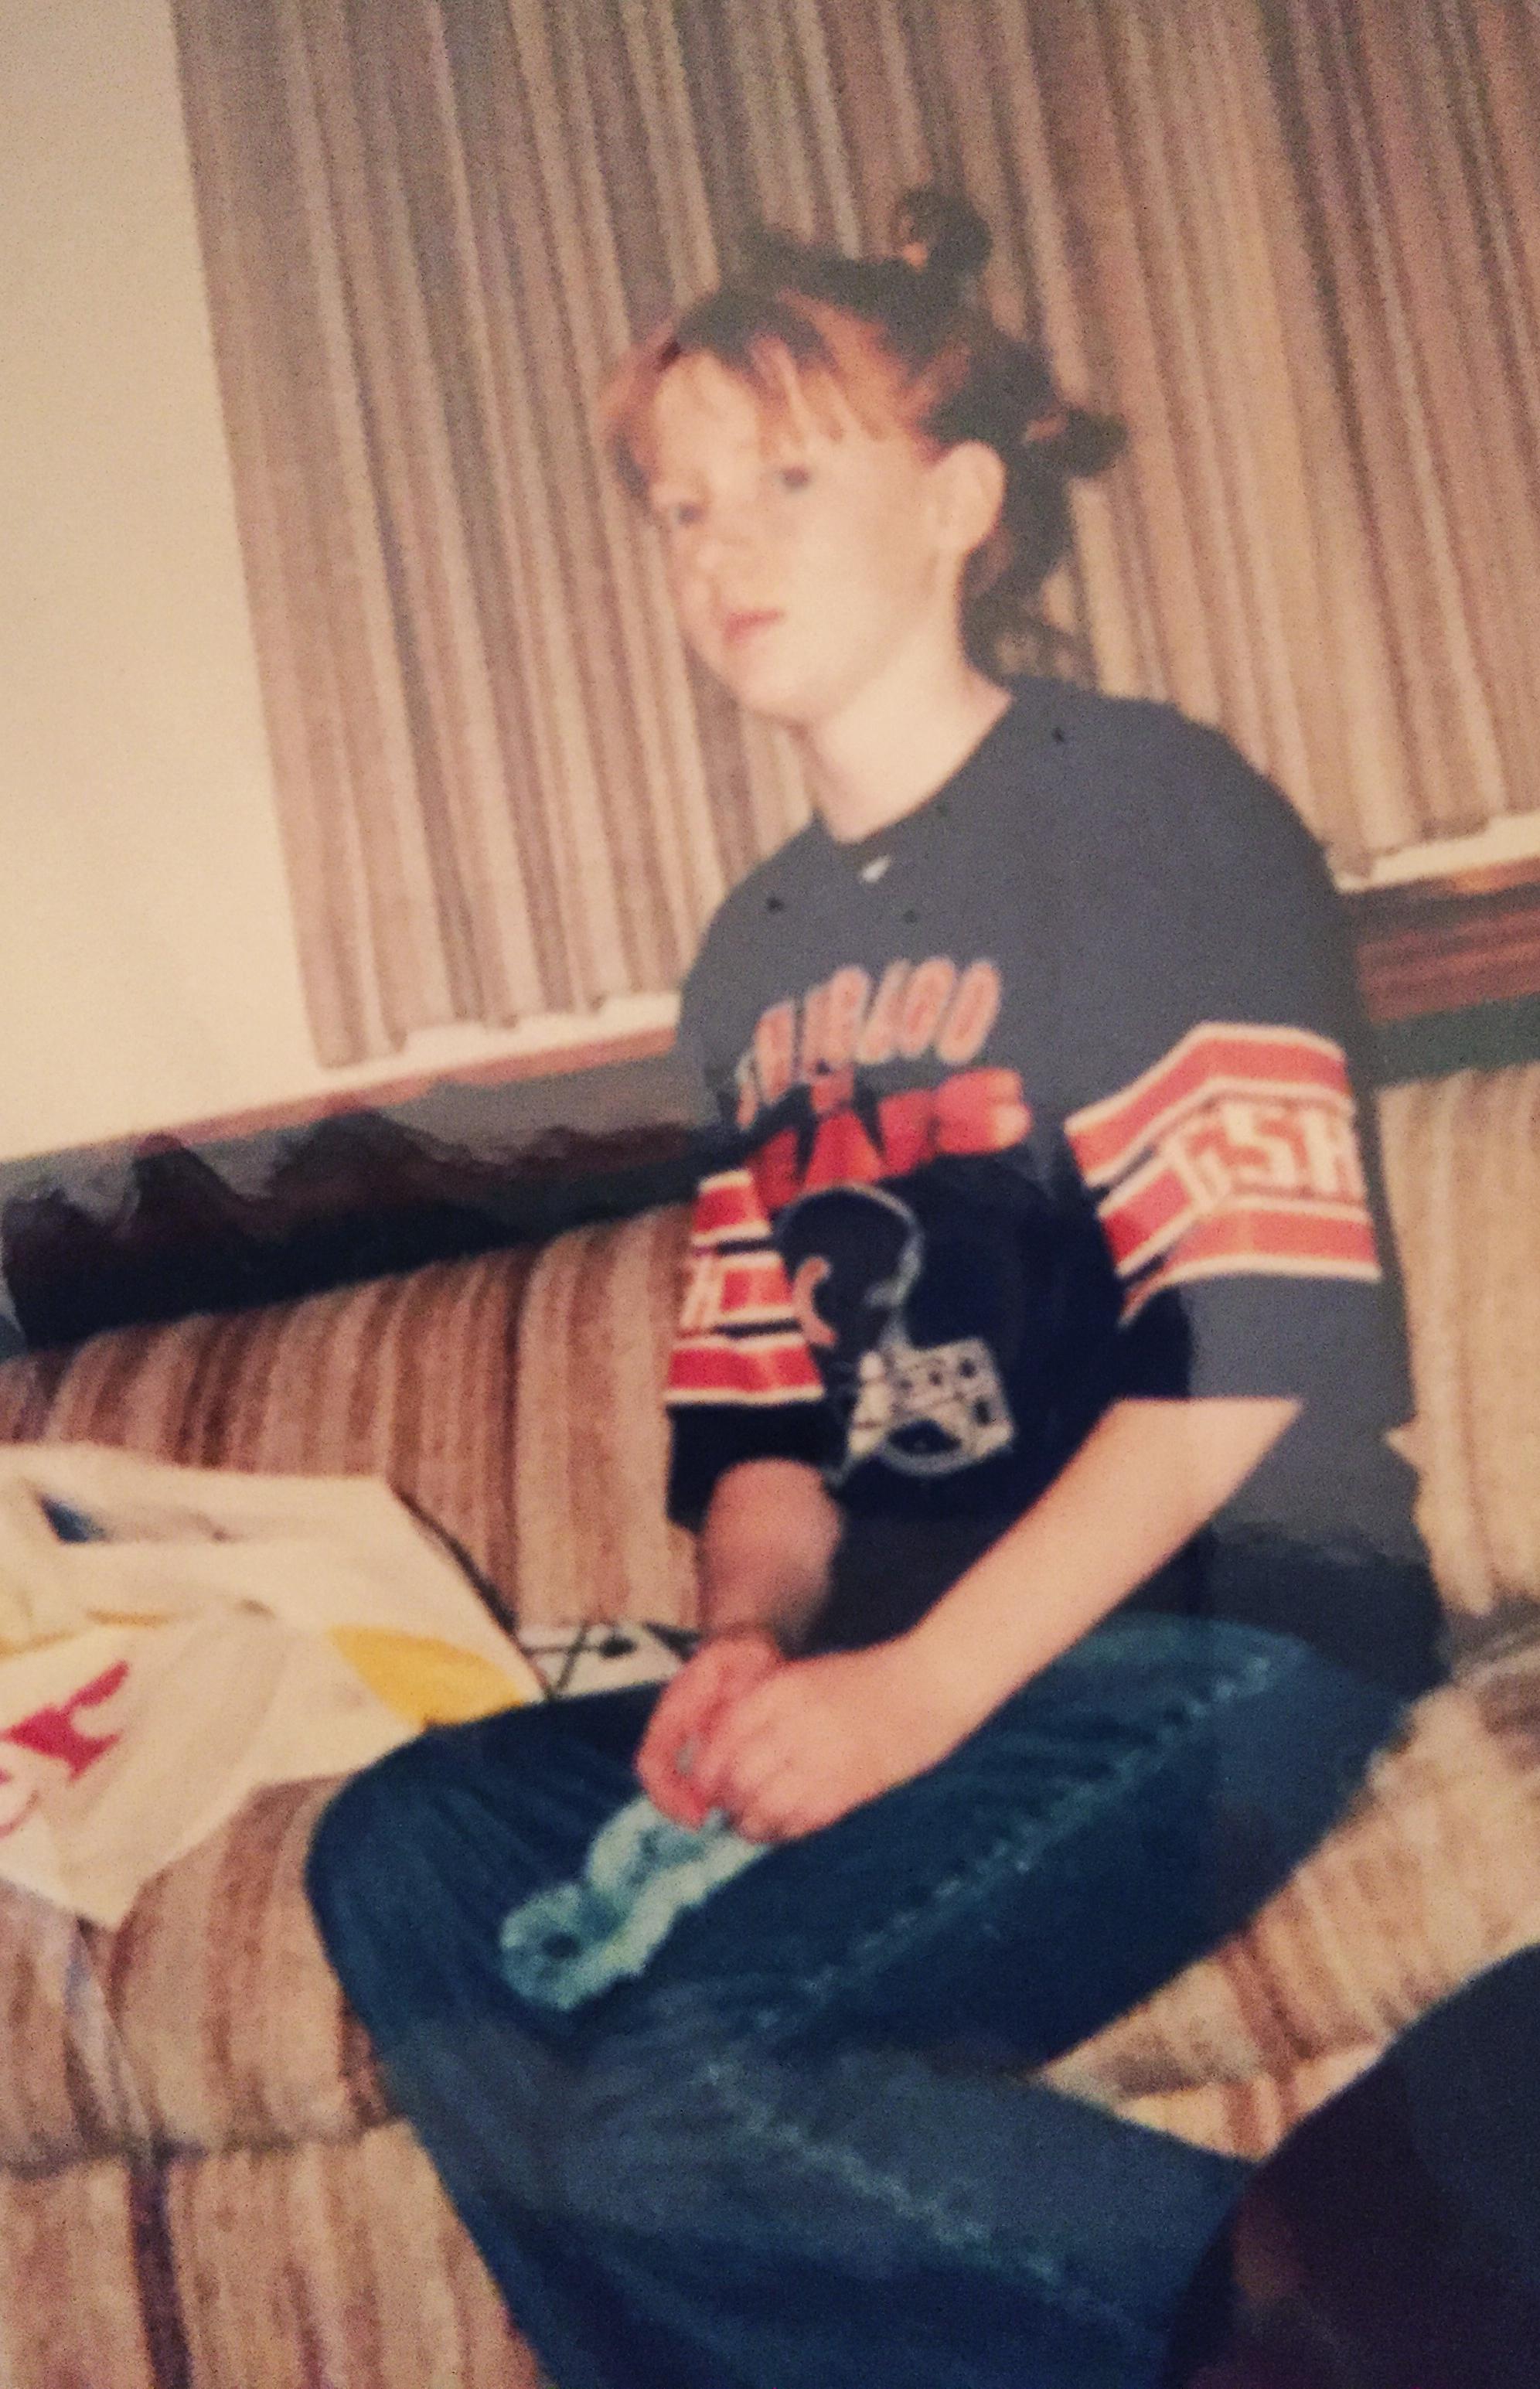 Me circa 12, in all my wacky girls'sleepover 'do glory.